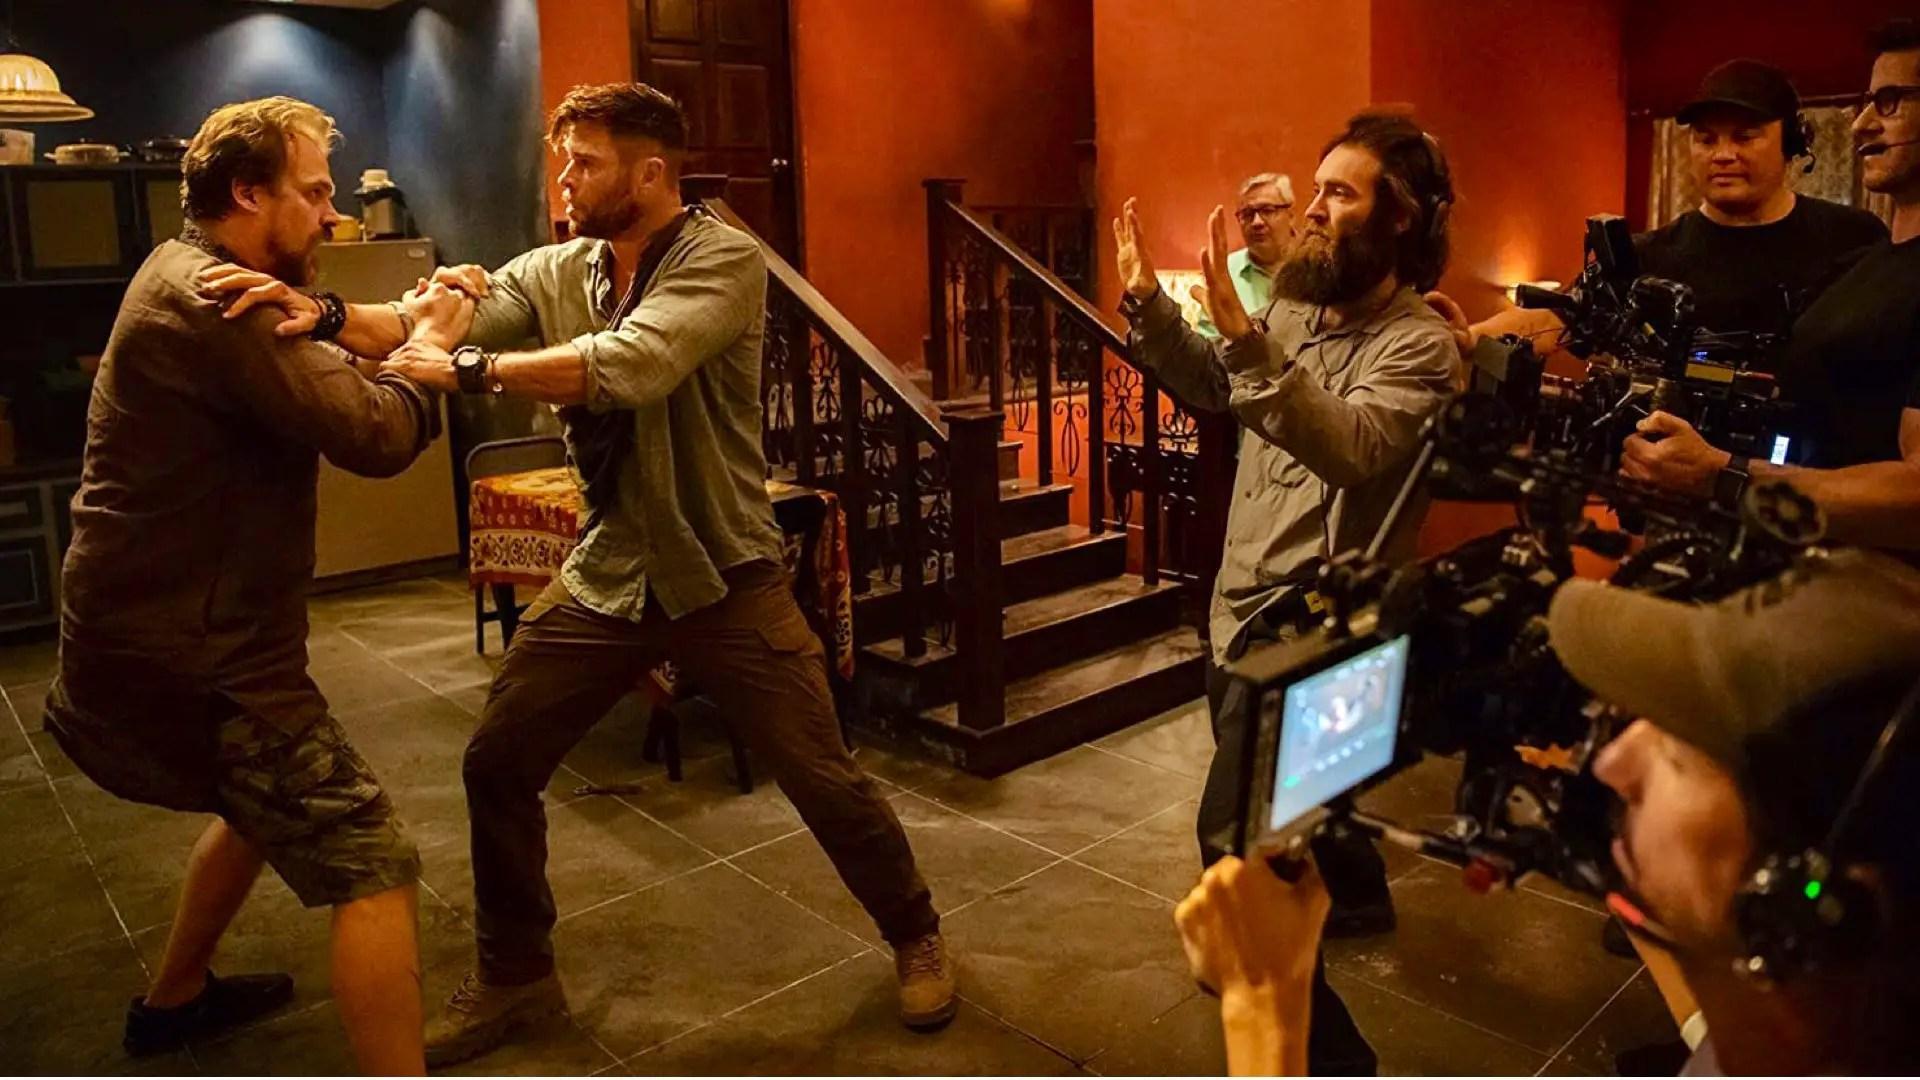 Chris Hemsworth on the Big Camera Trick Netflix Pic